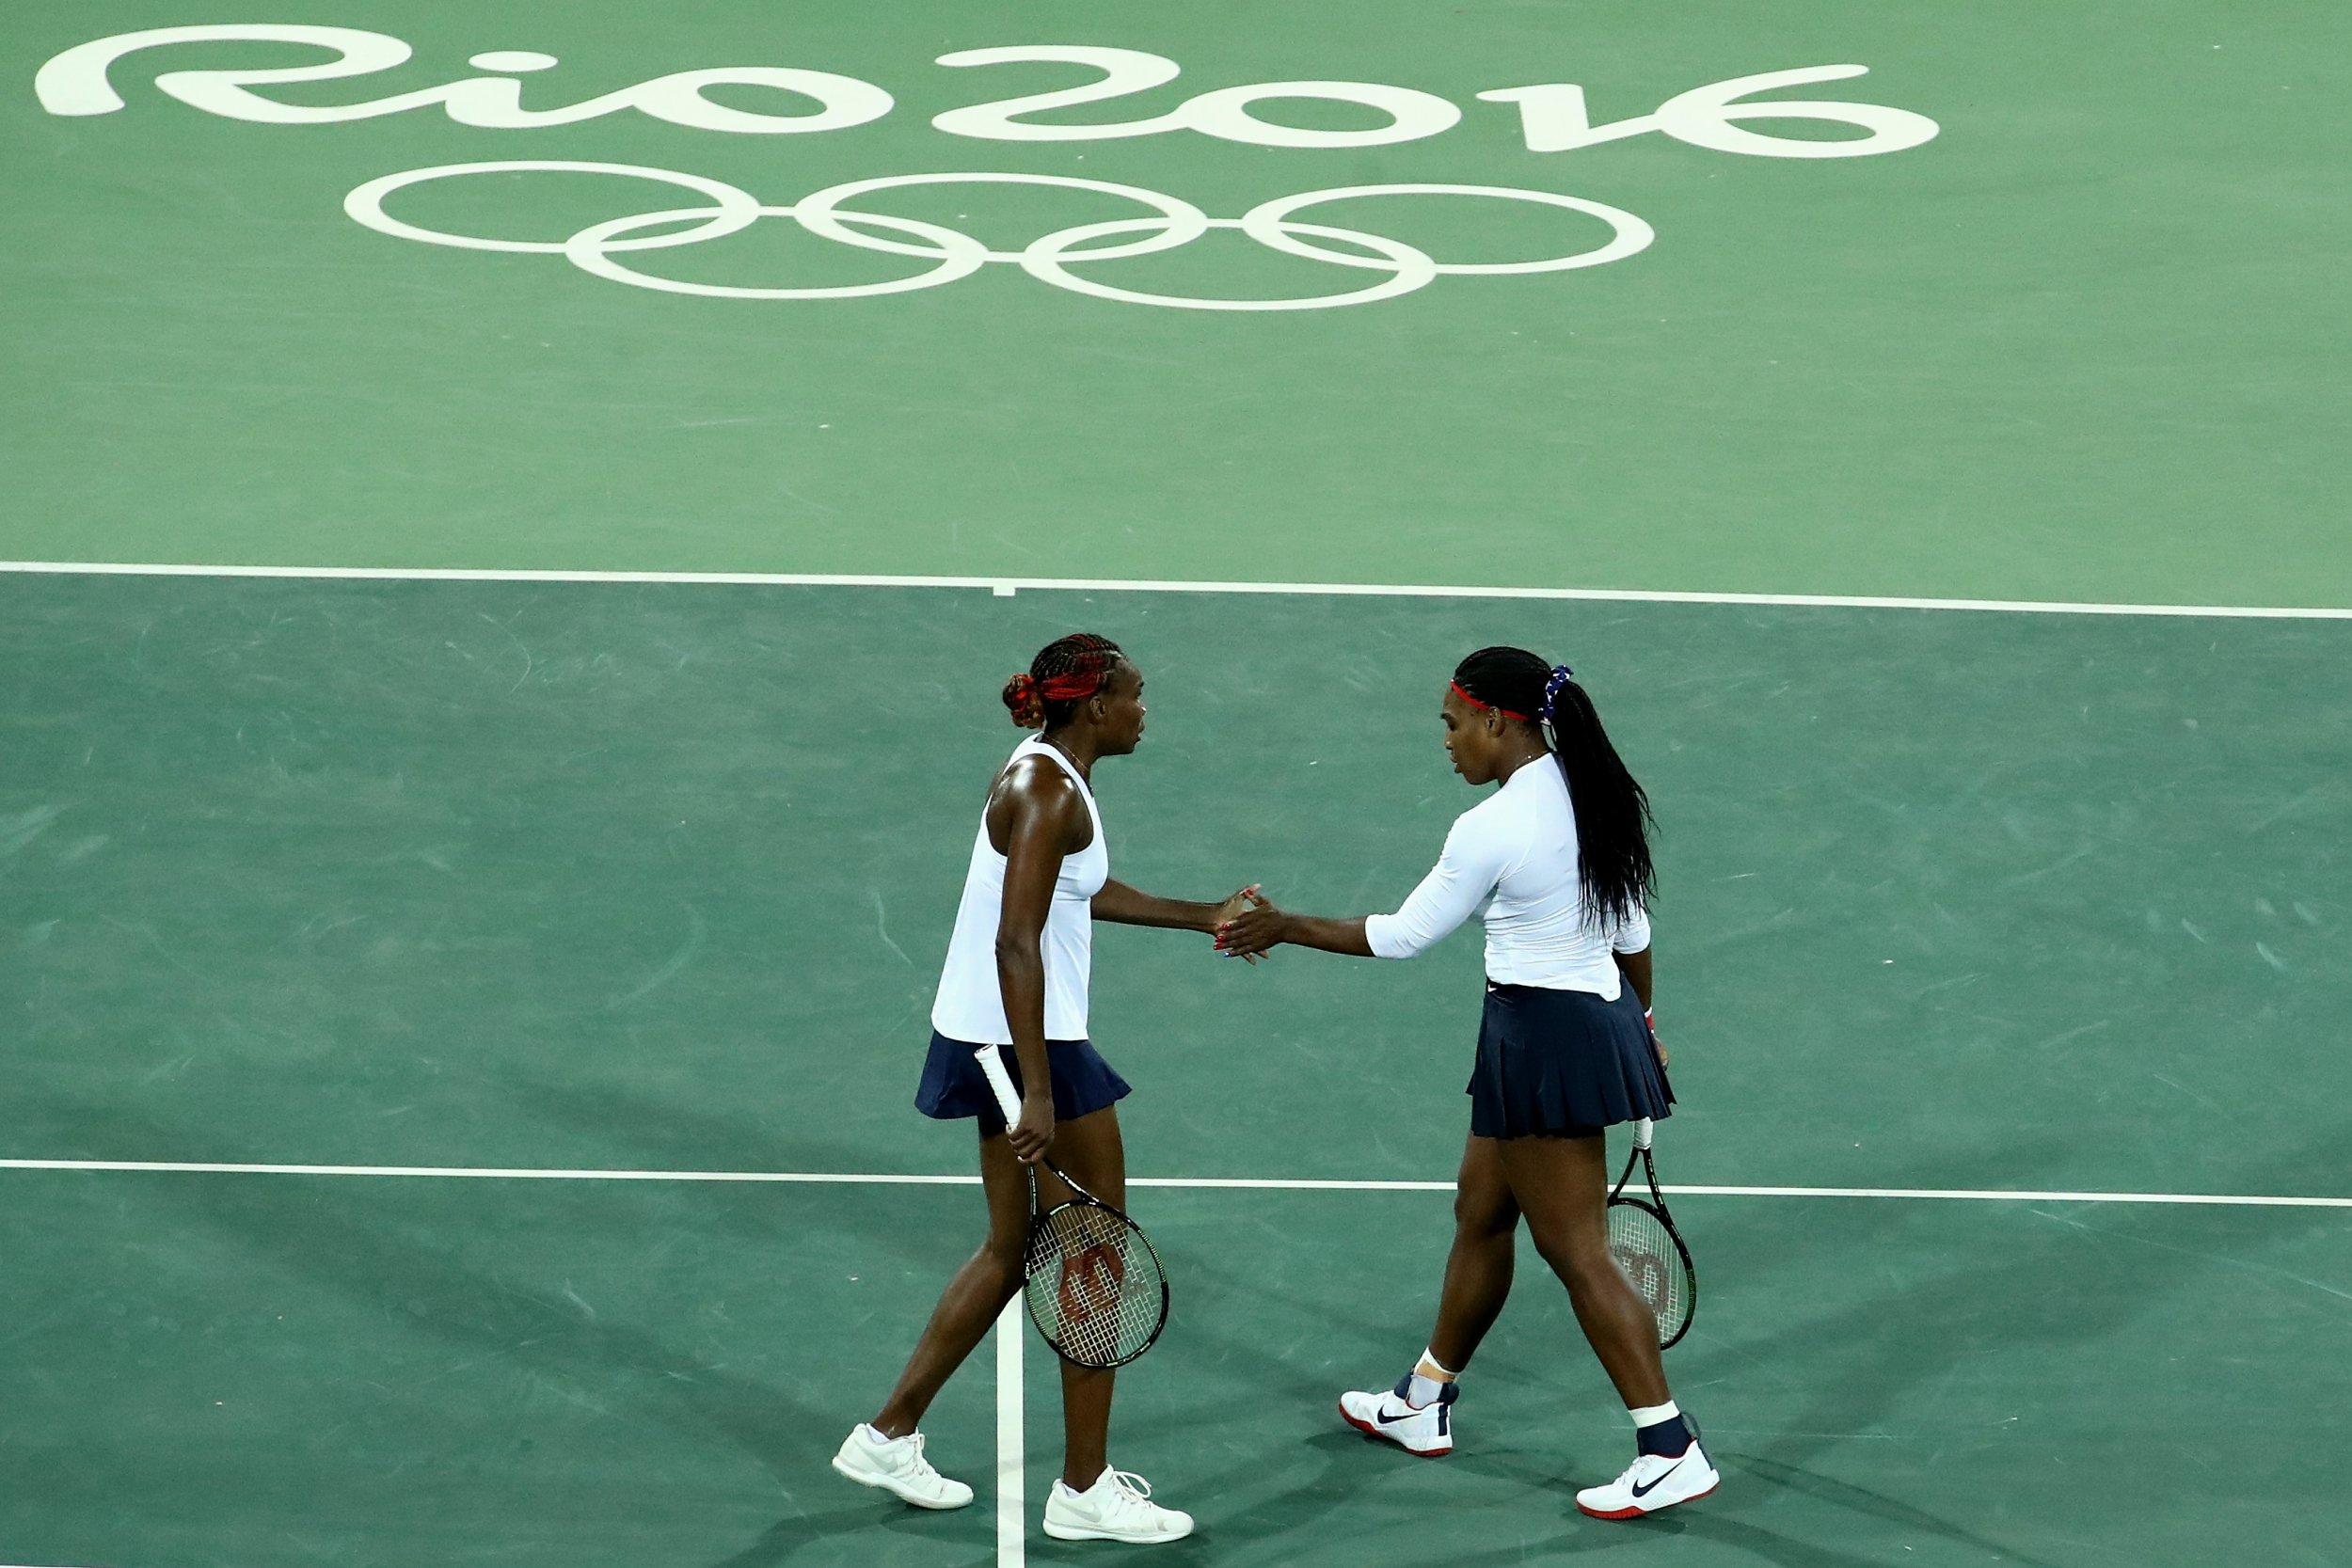 Venus and Serena Williams at the Rio 2016 Olympic Games.